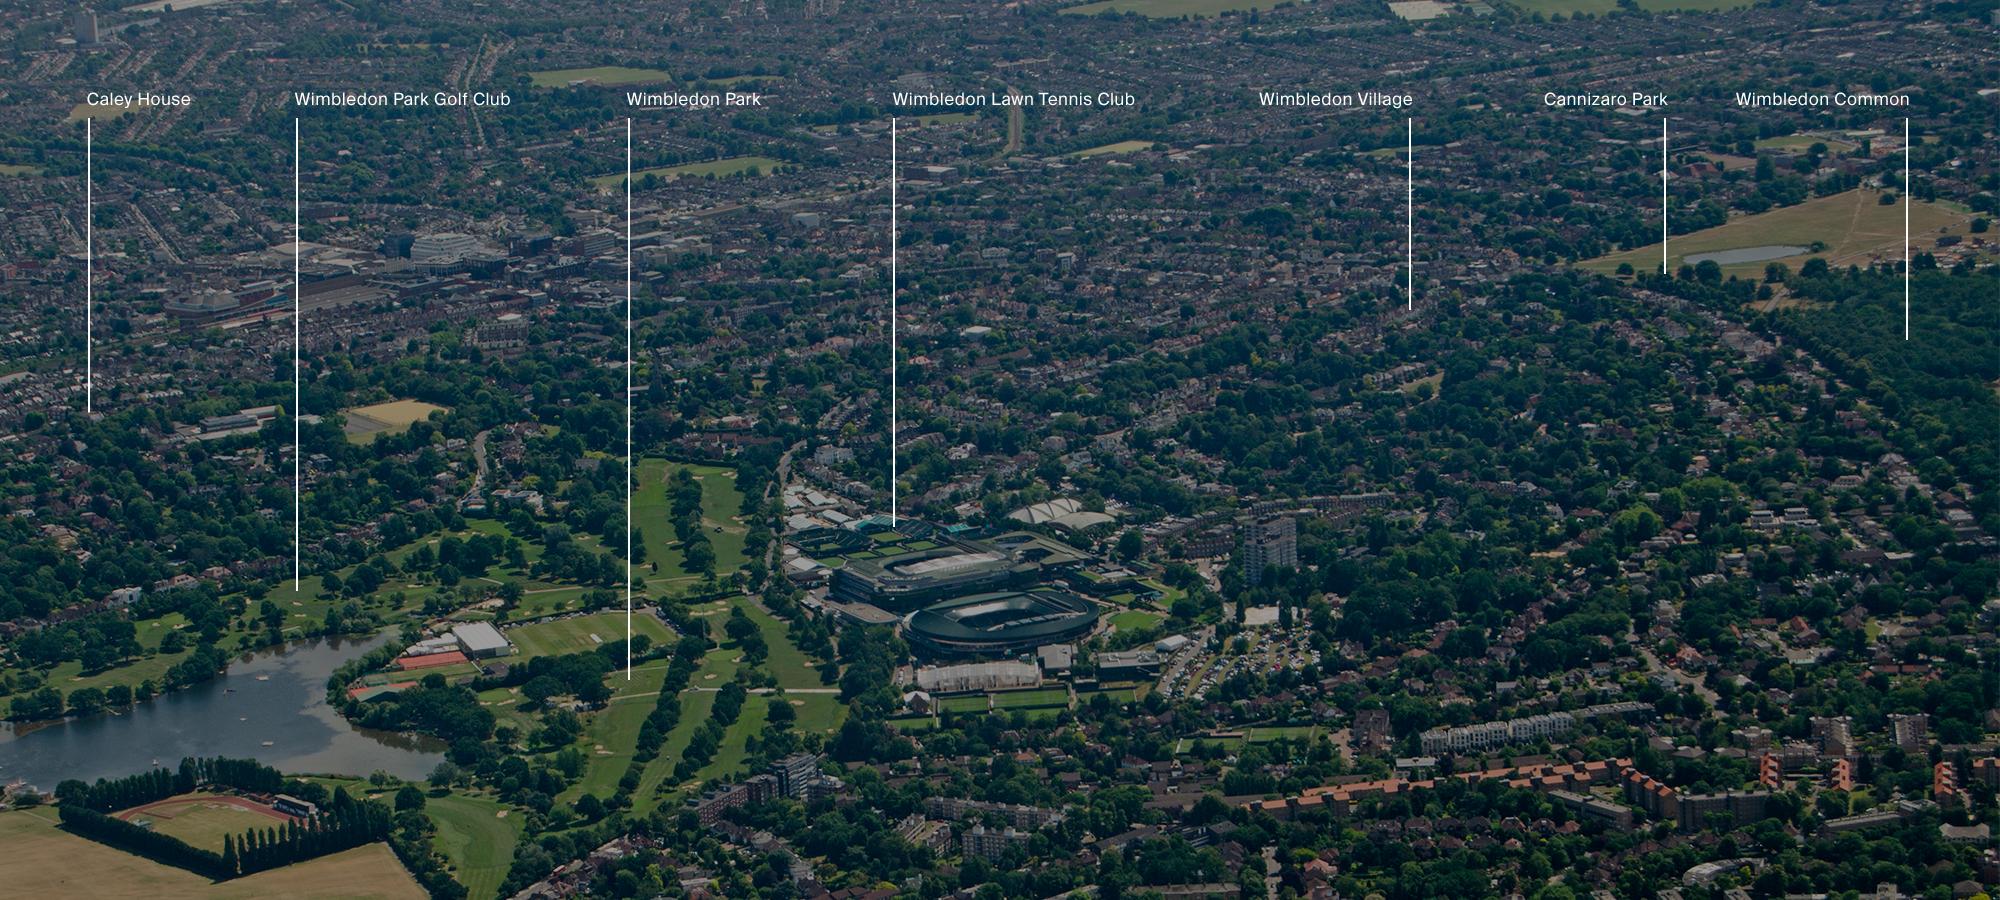 ch_wimbledon-aerial_16-9_img.jpg